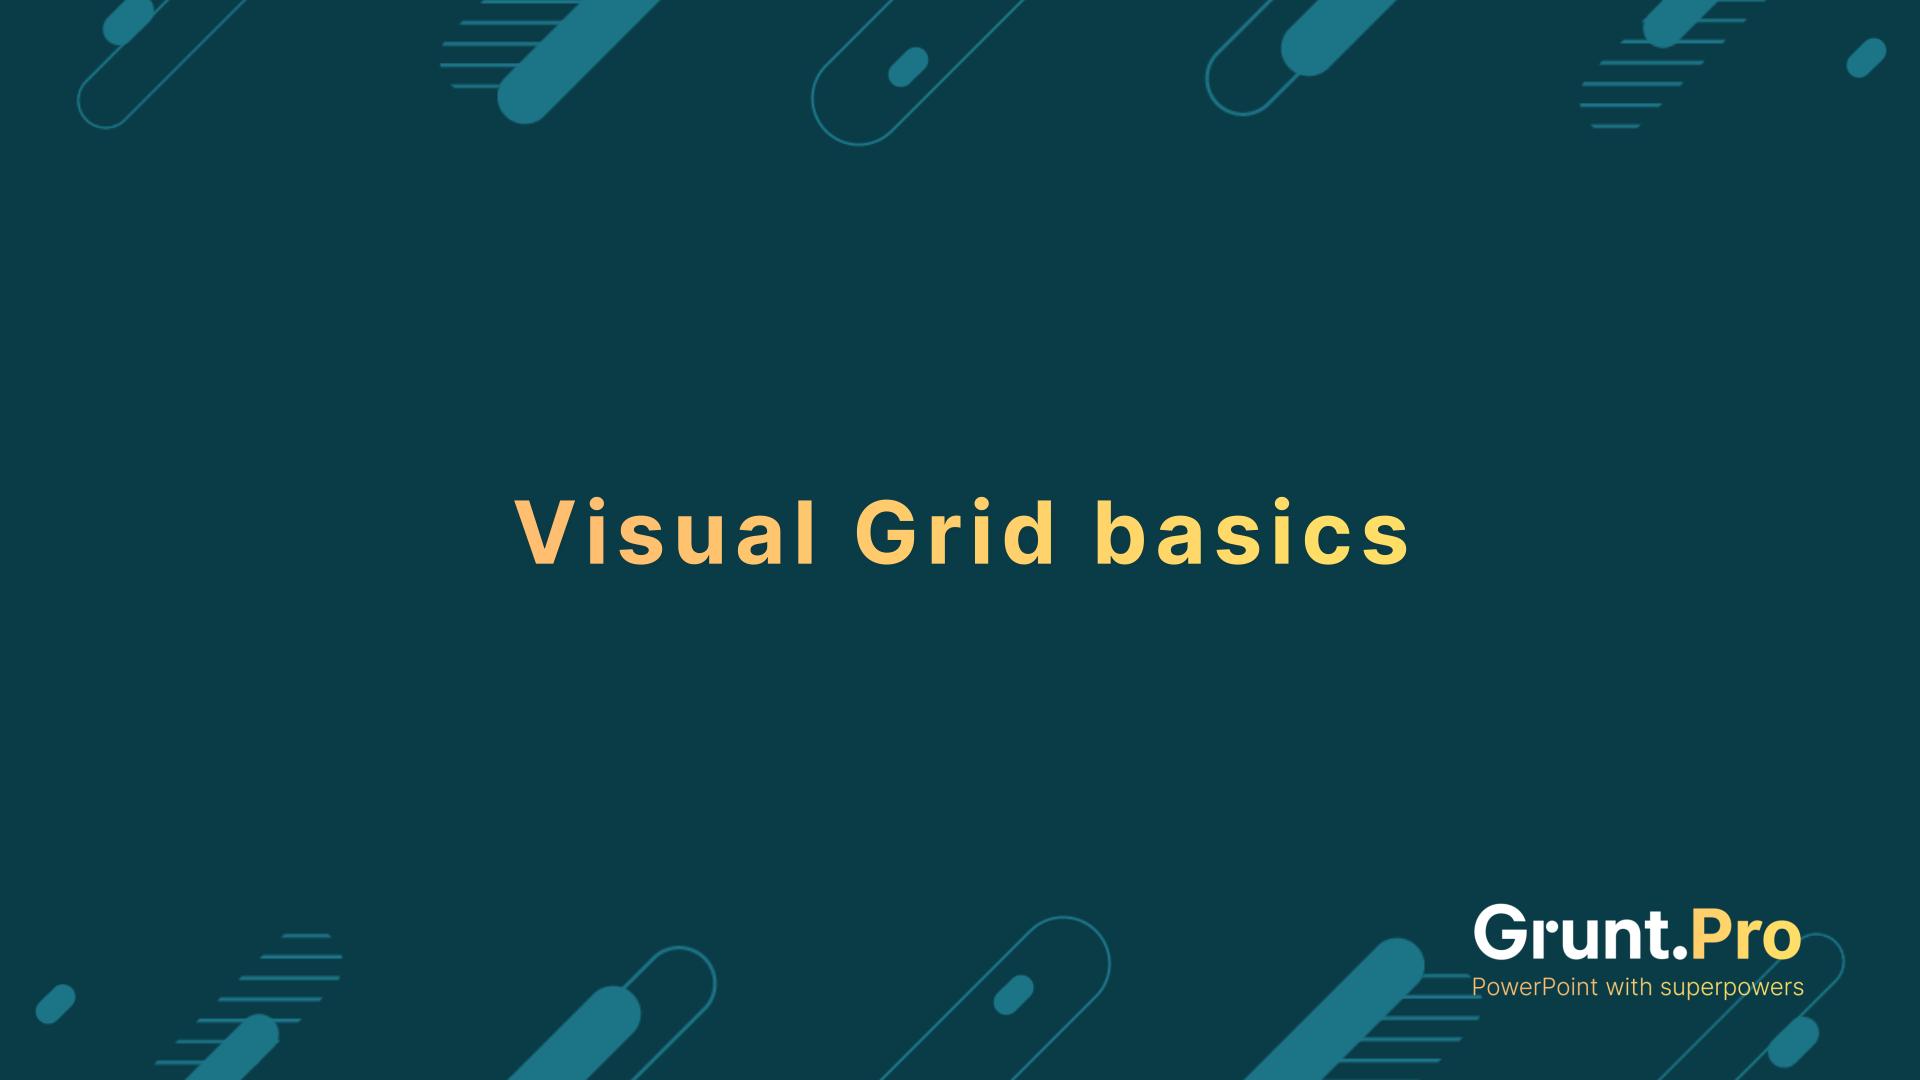 Visual grid basics